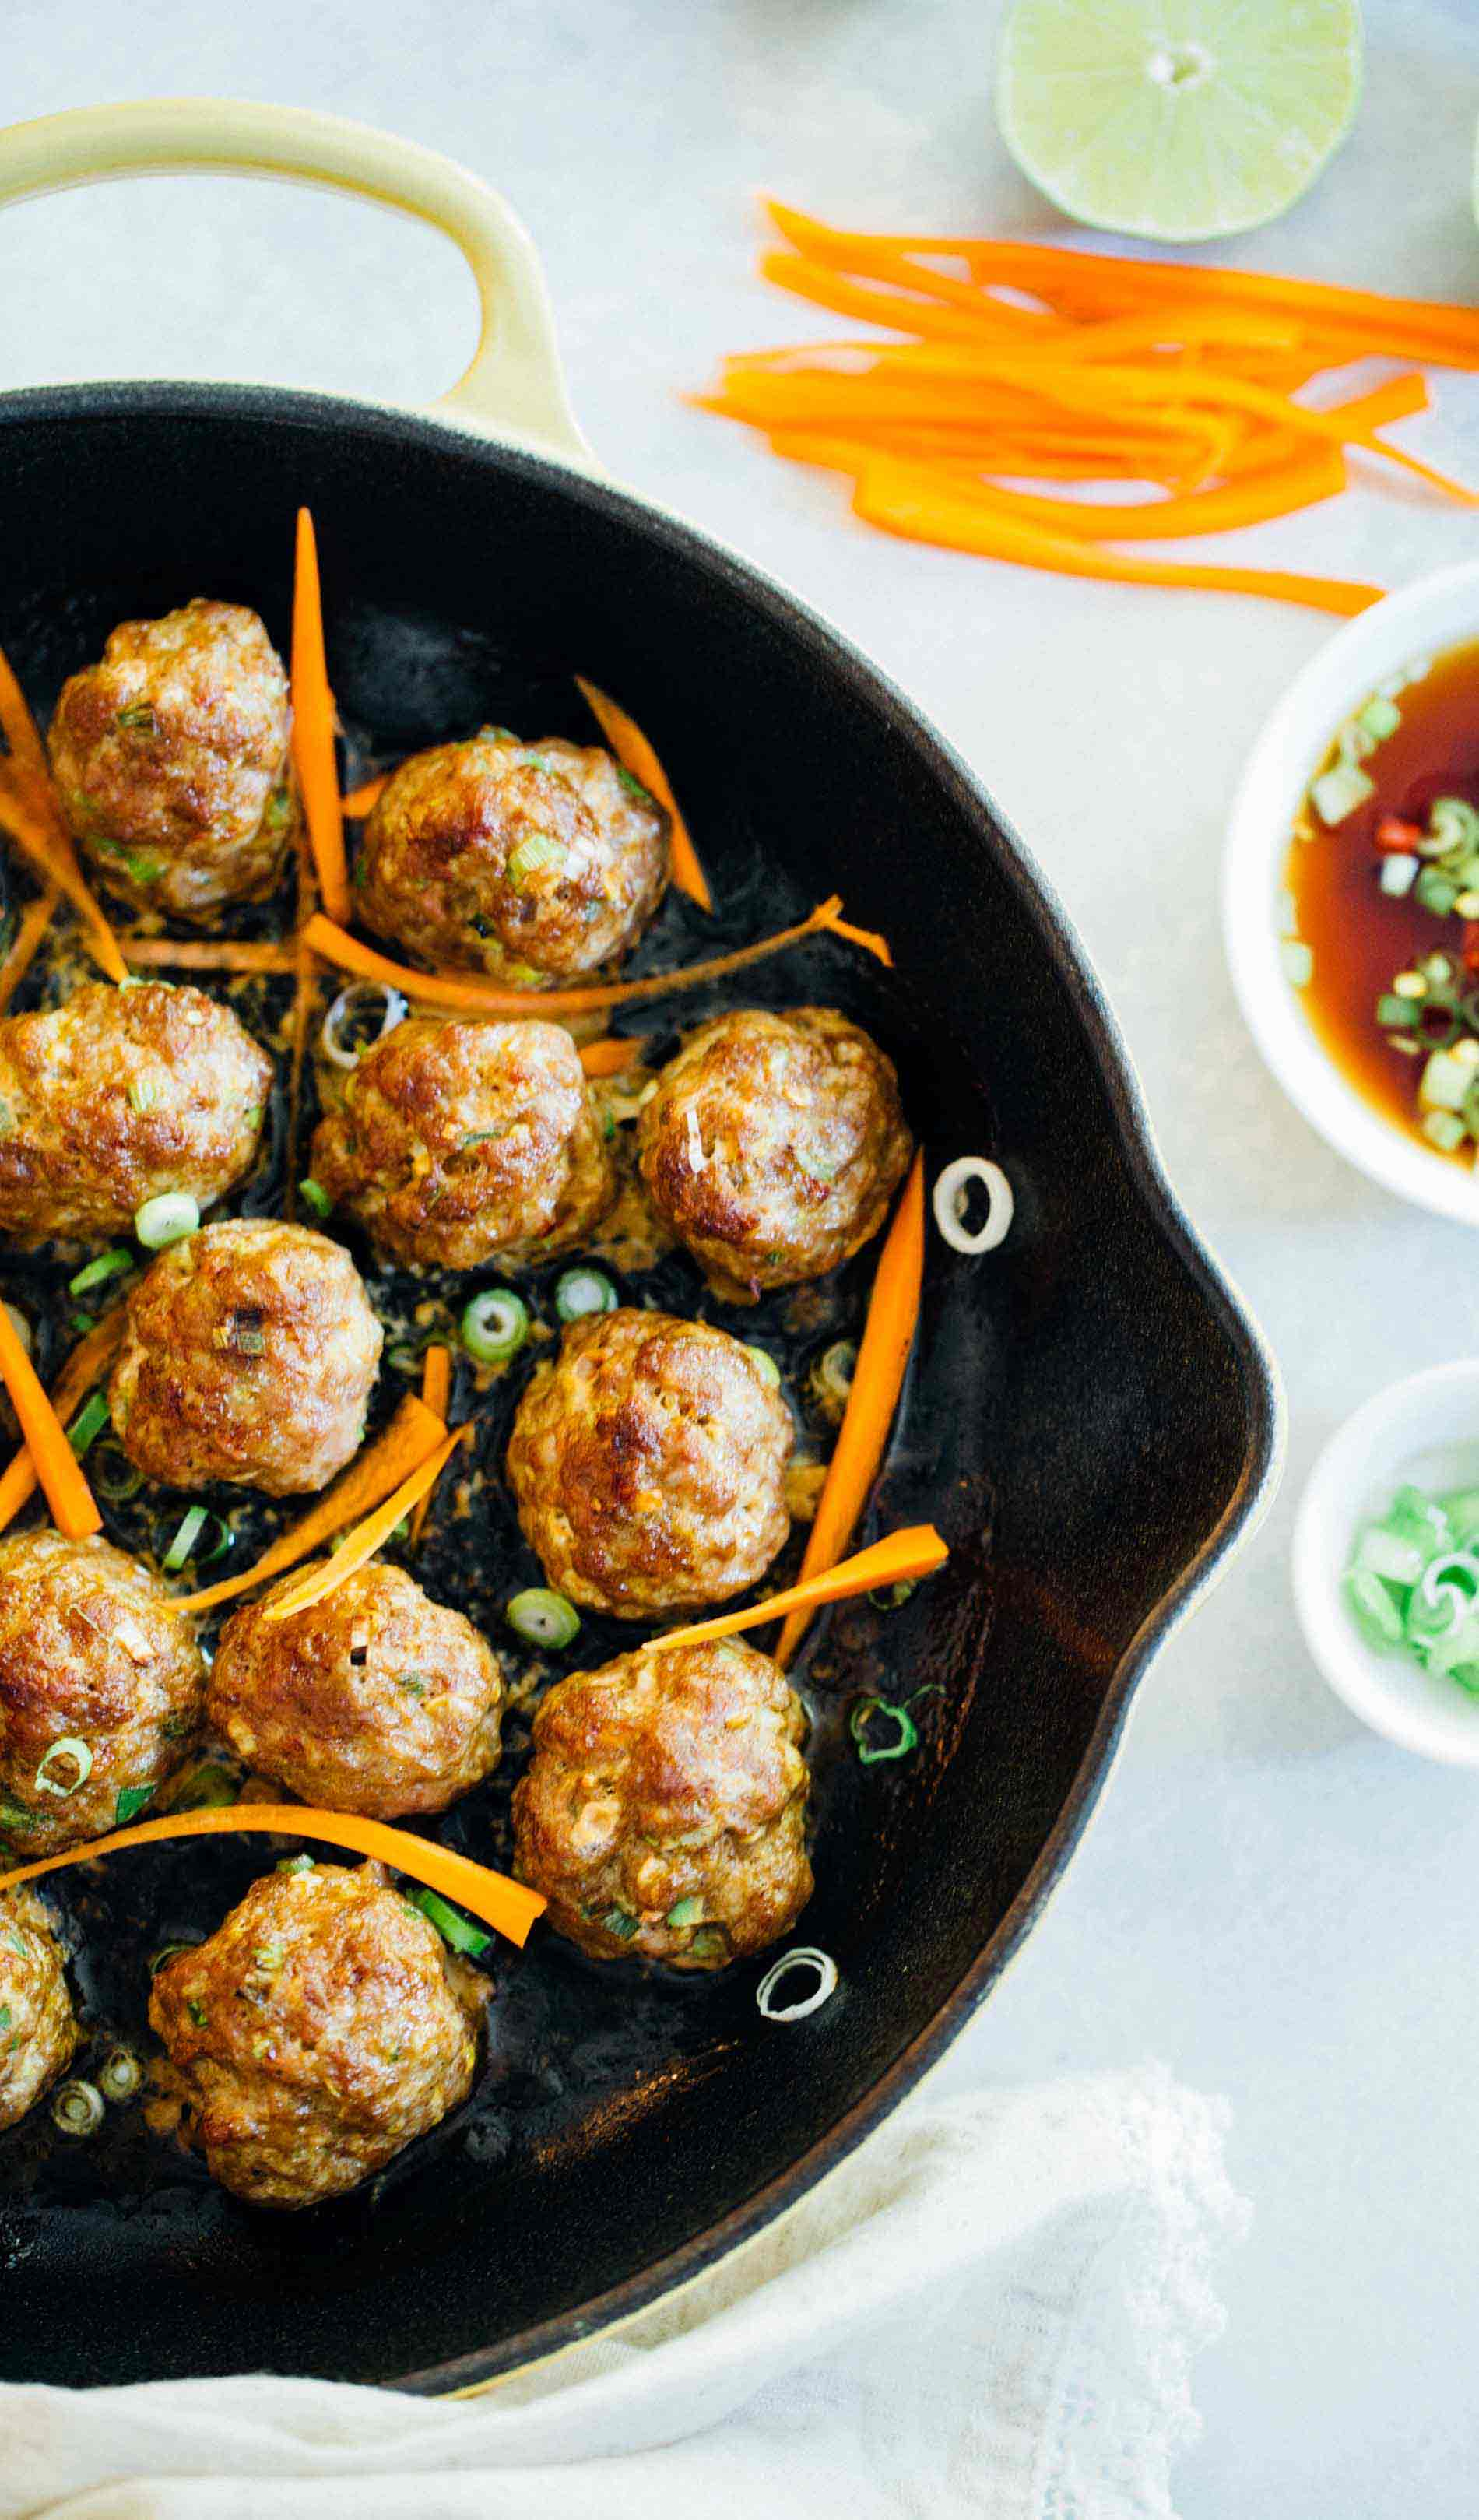 Asian Pork Meatballs - Easy Asian Meatballs for Rice or